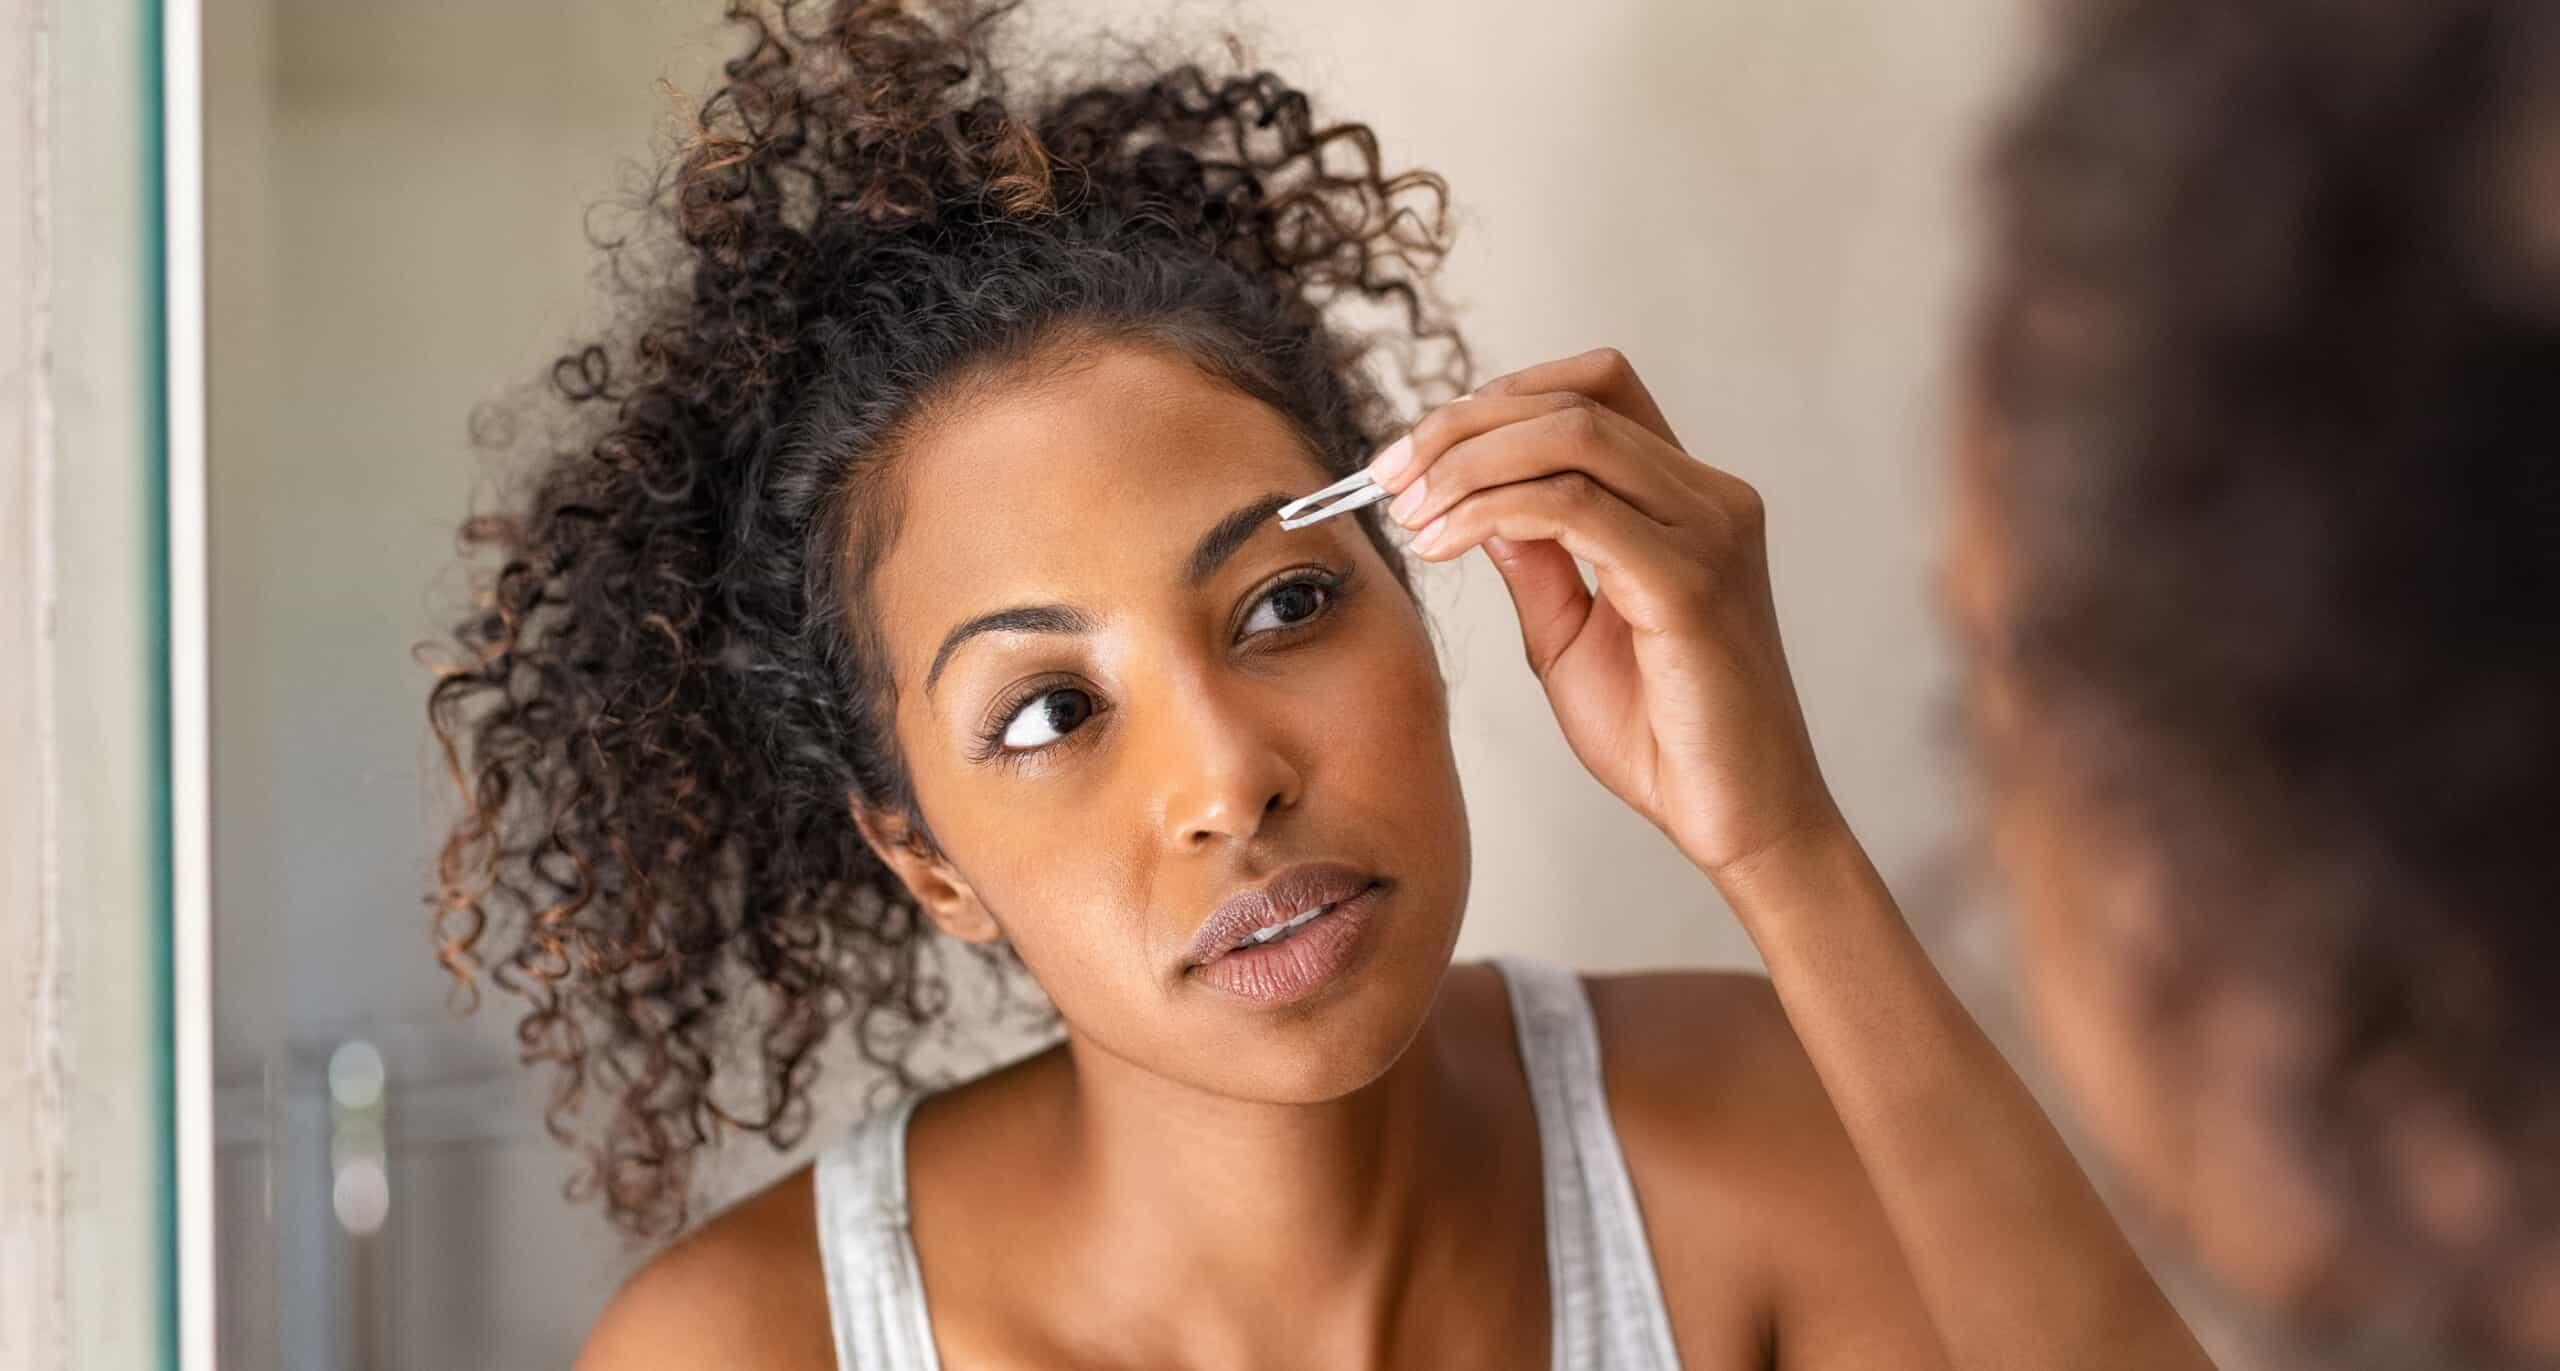 woman shaping eyebrows at home